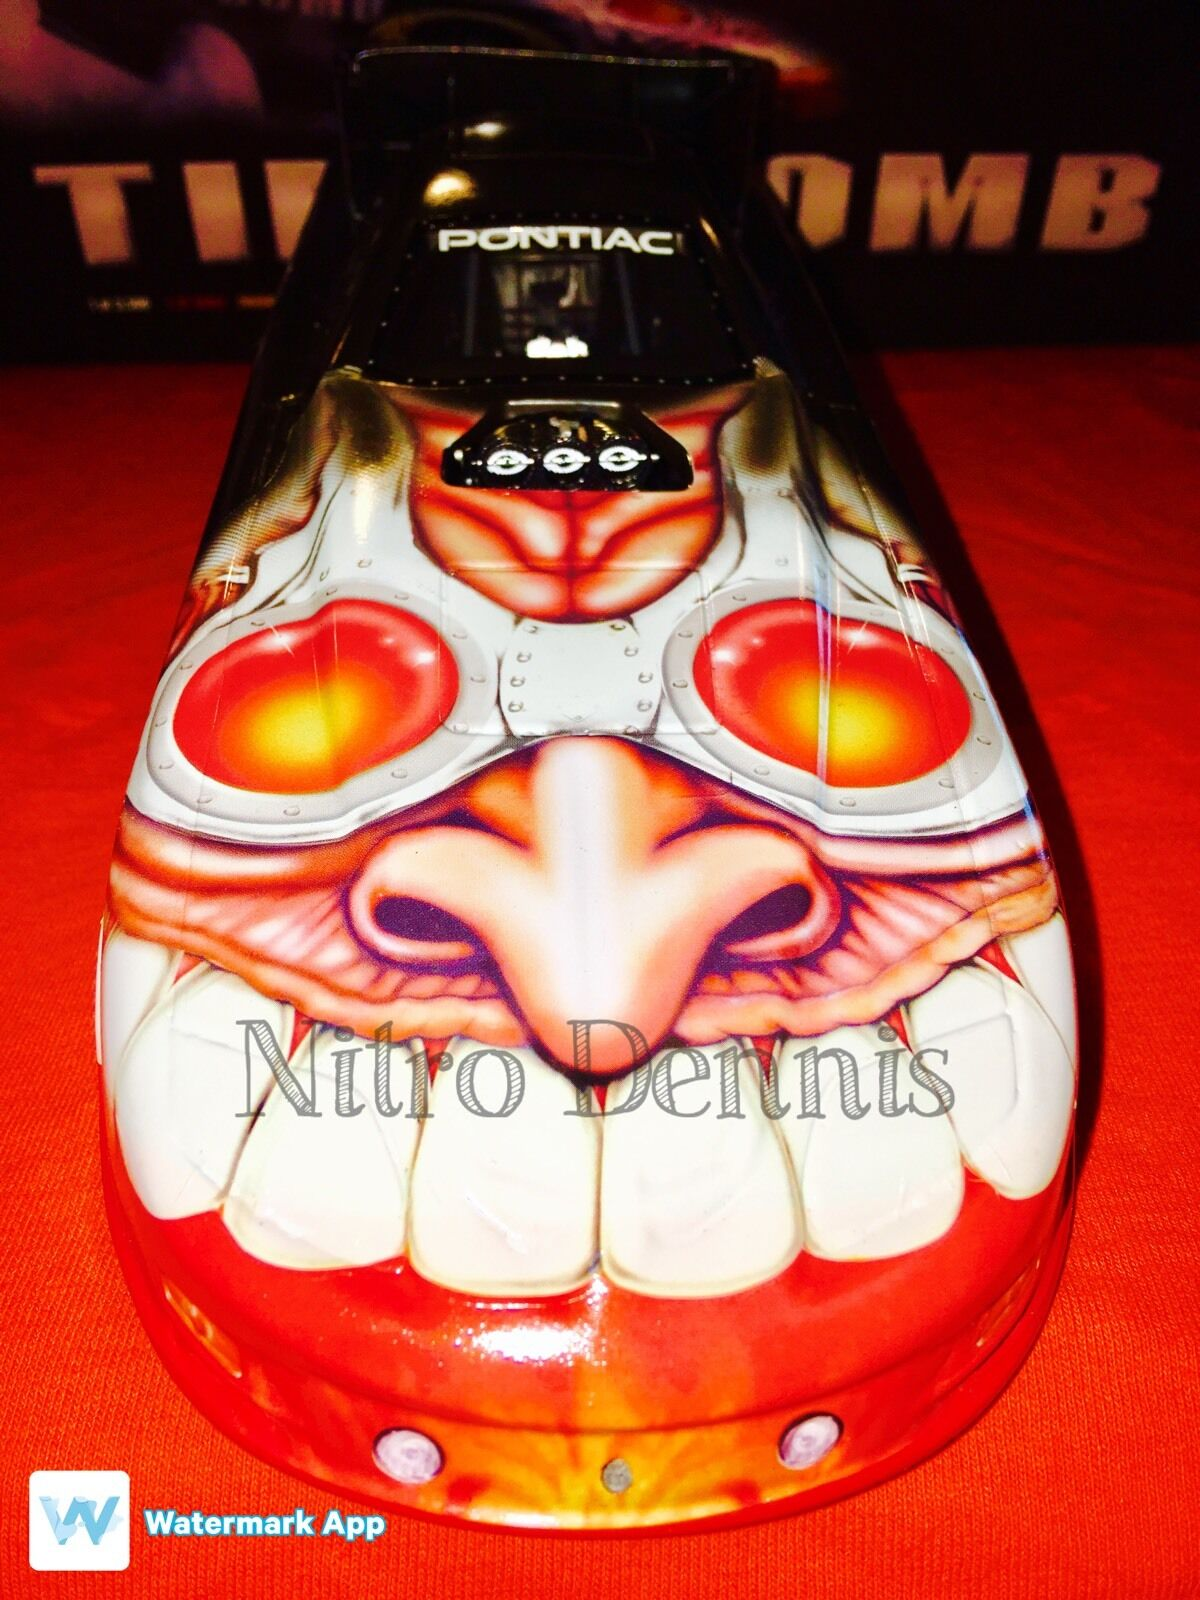 NHRA SCOTTY CANNON 1 16 Milestone 02 Funny Car NITRO Firebird TIME BOMB Diecast